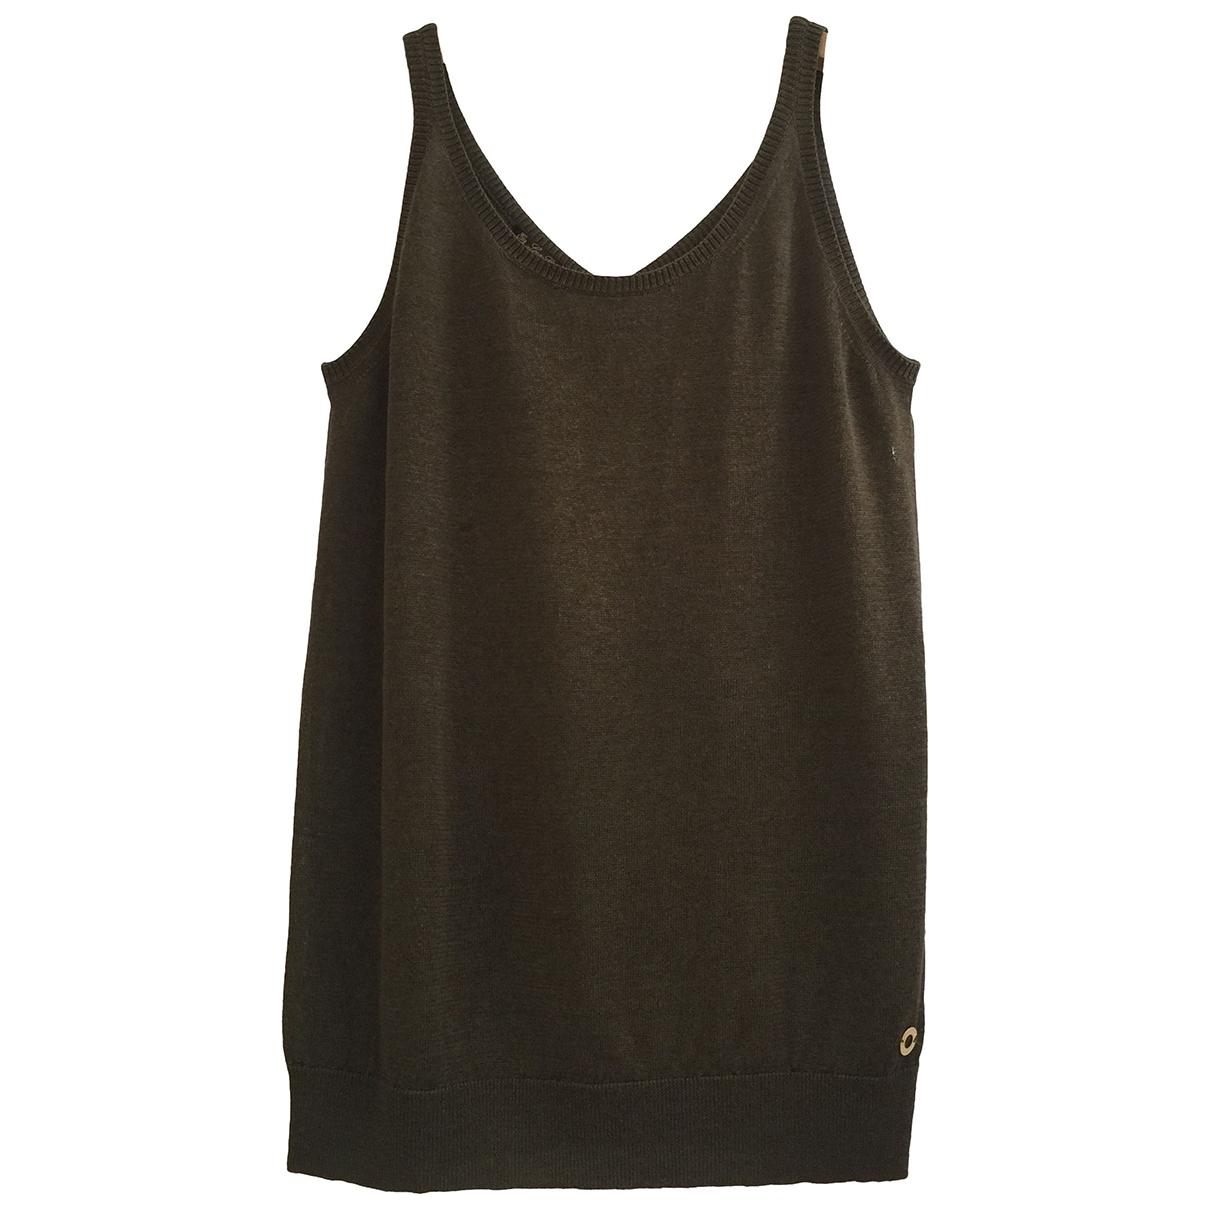 Camiseta sin mangas de Lana Loro Piana